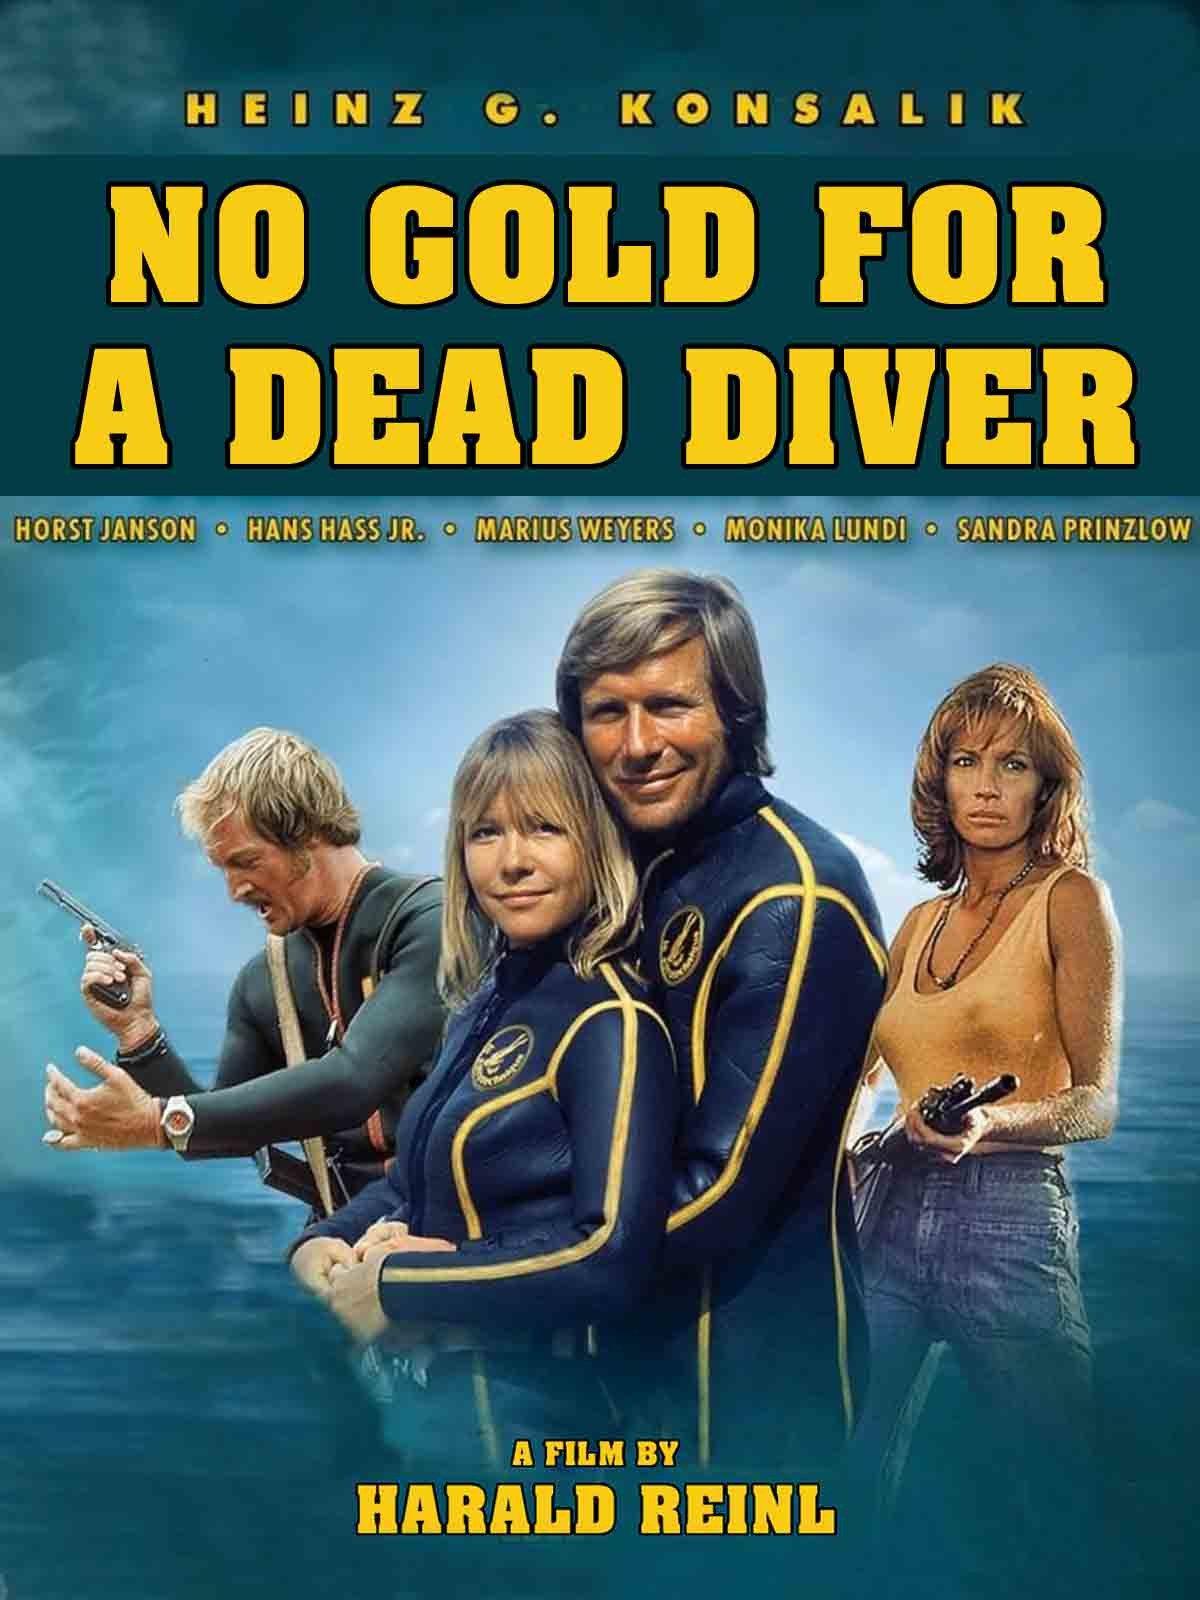 No Gold For A Dead Diver